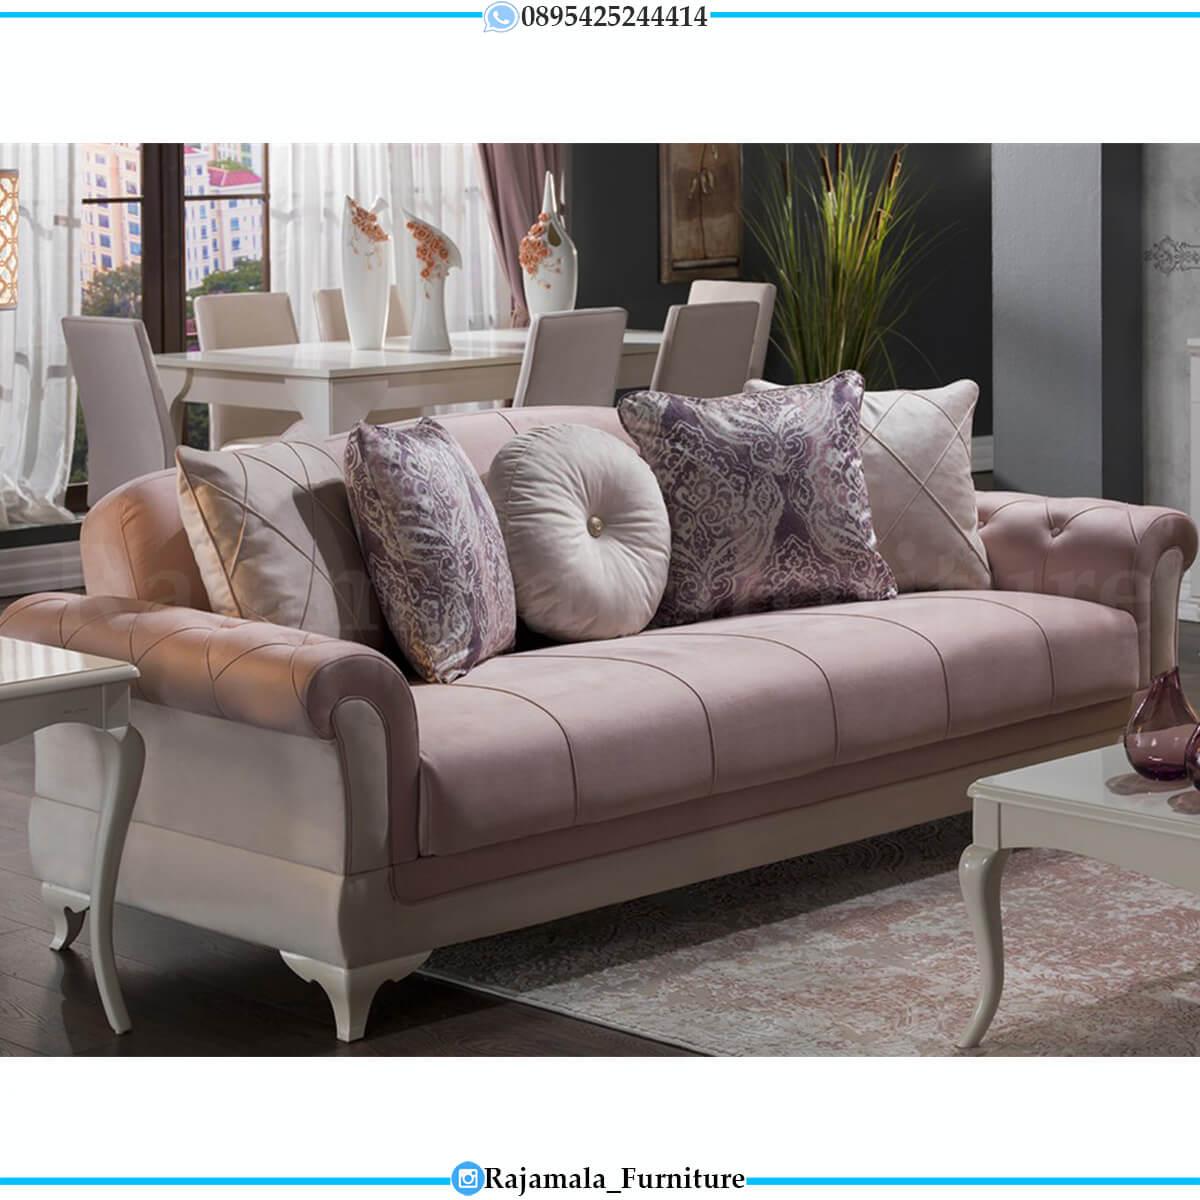 New Sofa Tamu Minimalis Modern Simple Elegant Design RM-0630